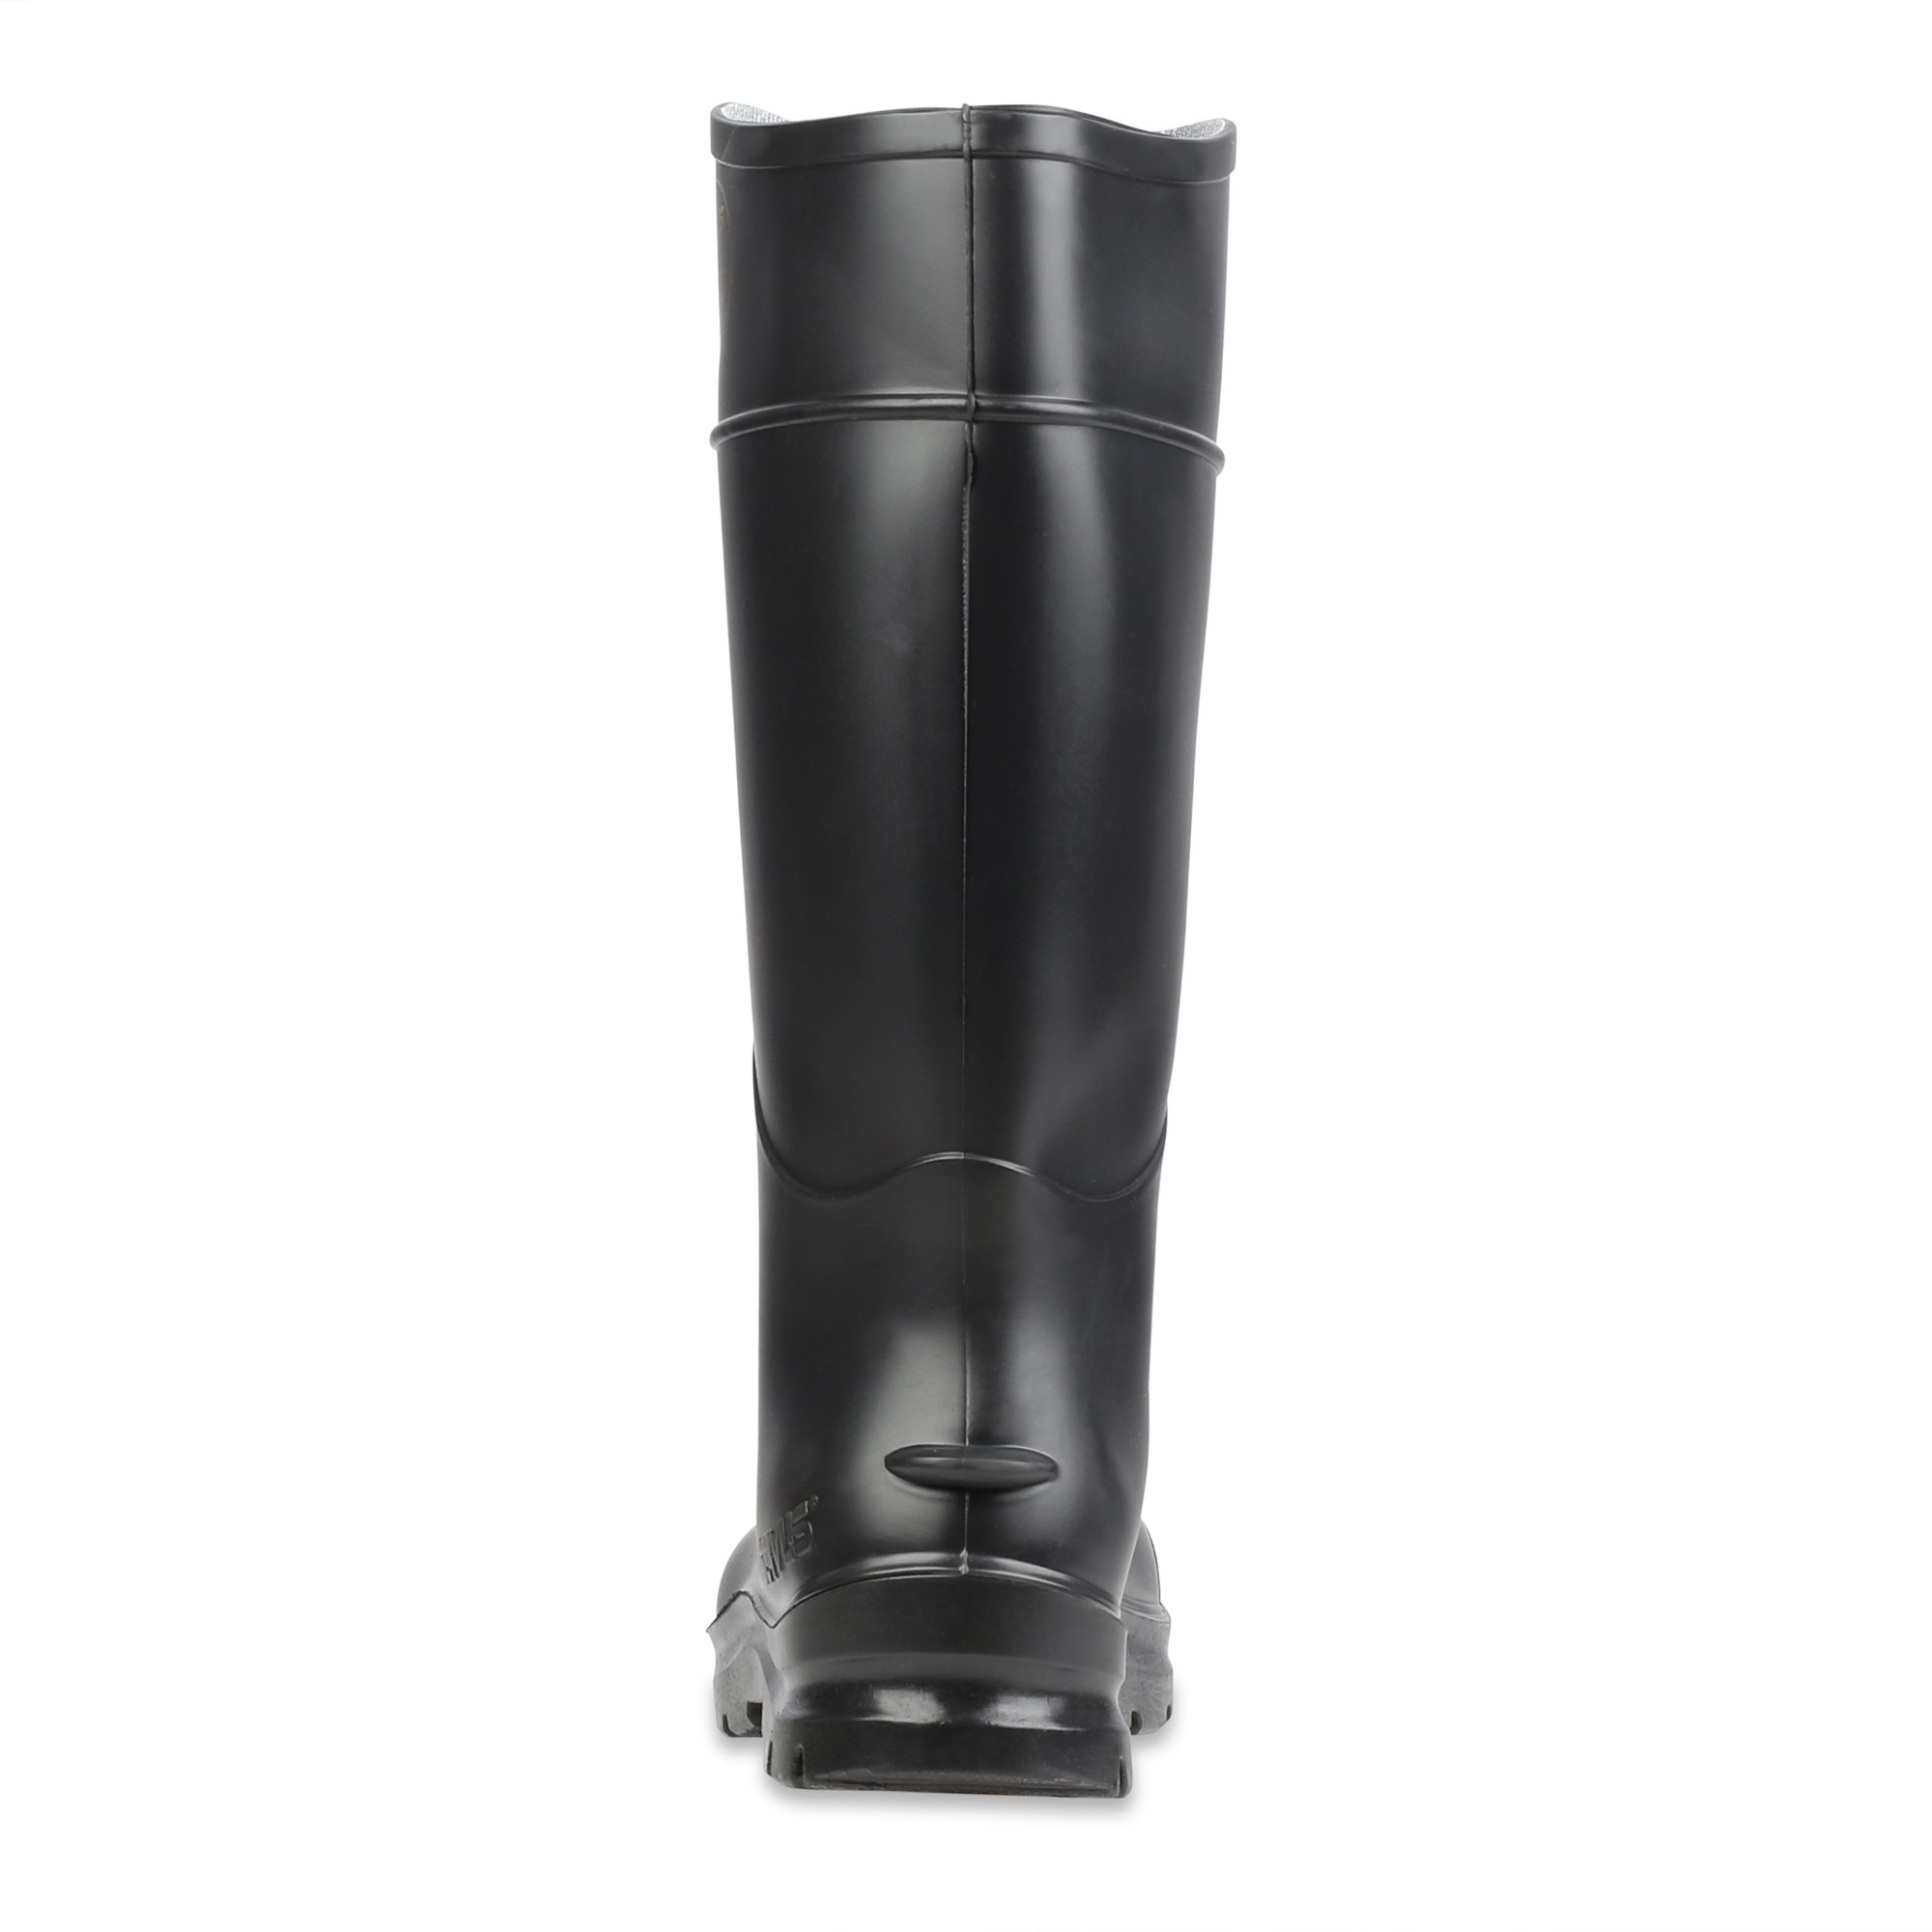 Servus Comfort Technology 14'' PVC Steel Toe Men's Work Boots, Black, Size 10 (18821) by Servus (Image #2)